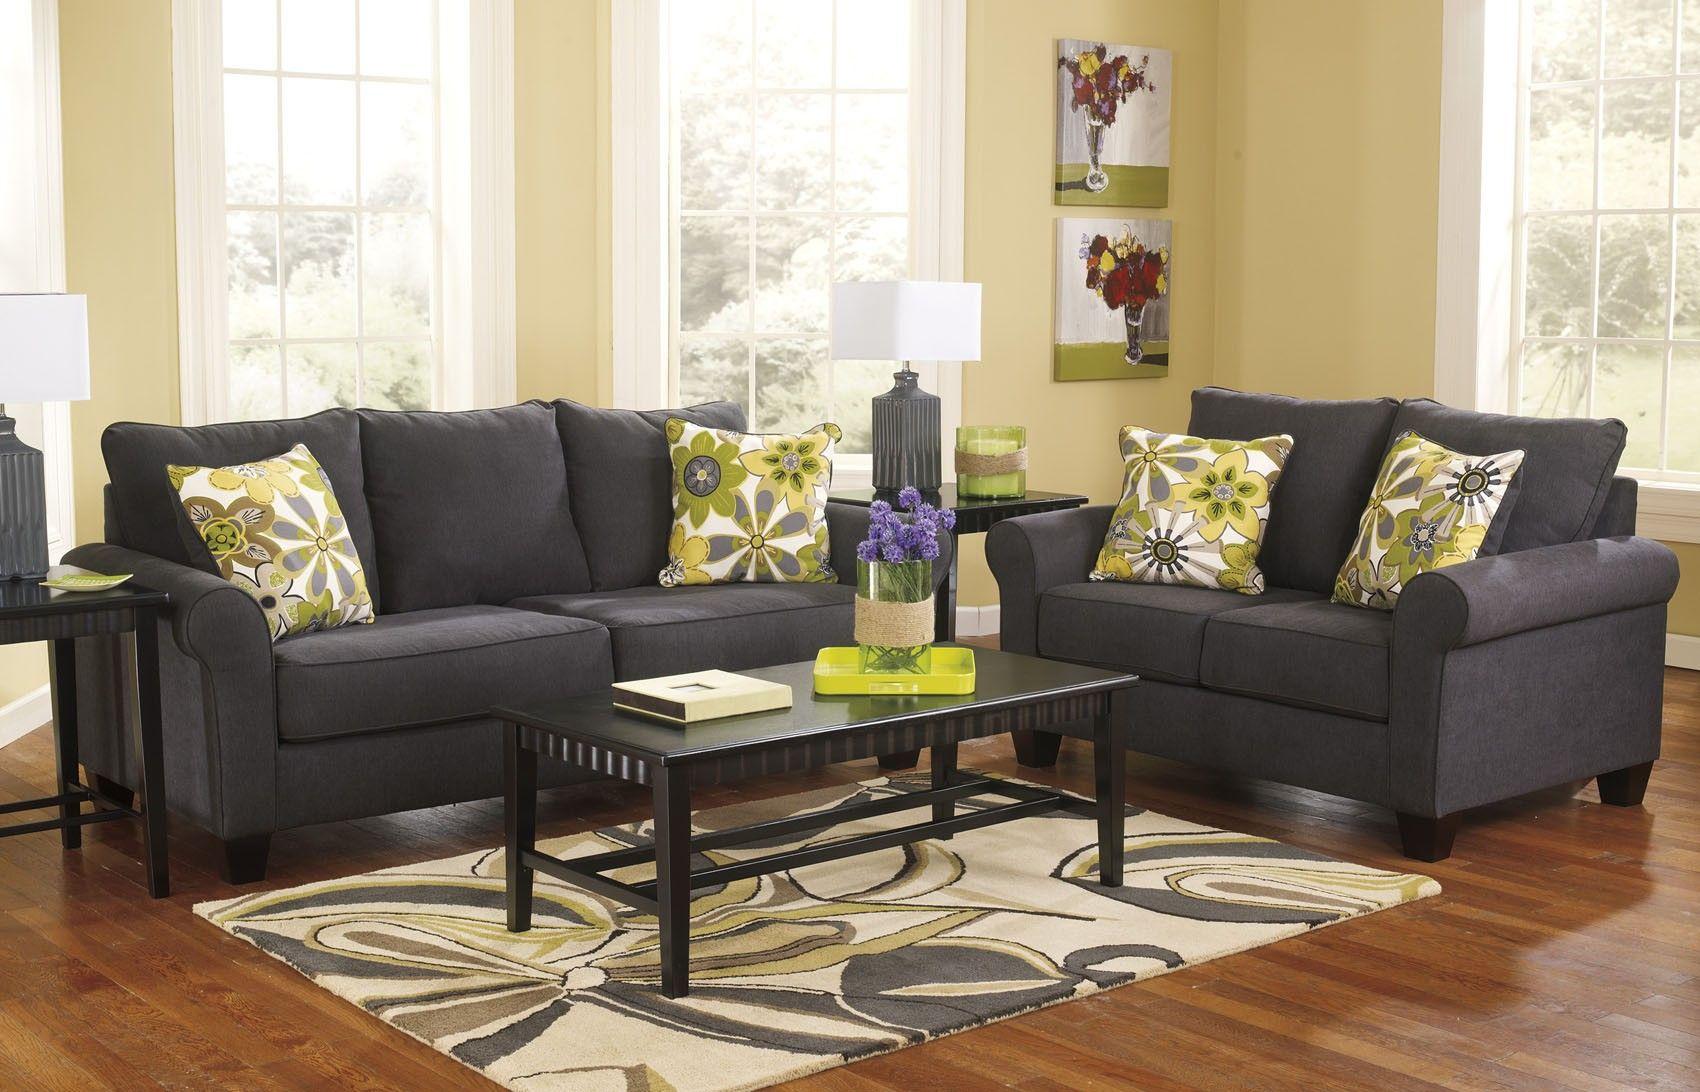 Stupendous Nolana Sofa And Loveseat Set 1650138 Ashley Furniture Home Interior And Landscaping Eliaenasavecom